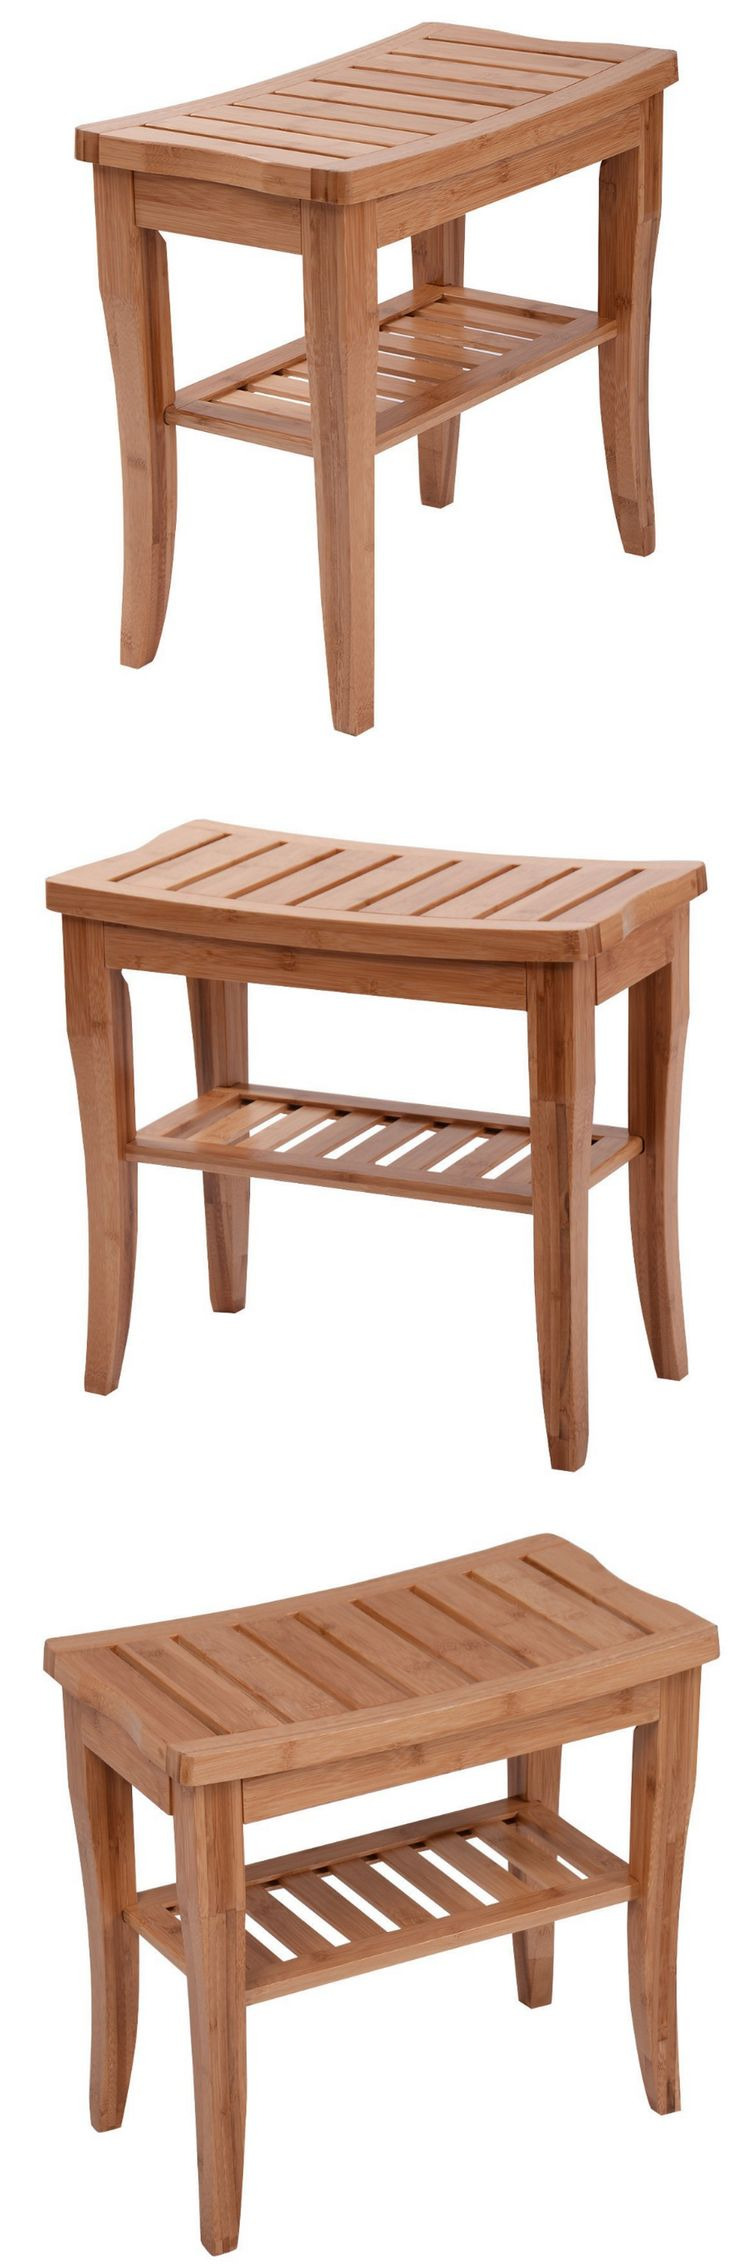 Shower and Bath Seats: Bathroom Bench Stool Wood Chair Storage Shelf Organizer Shower Seat Furniture -> BUY IT NOW ONLY: $69.93 on eBay!